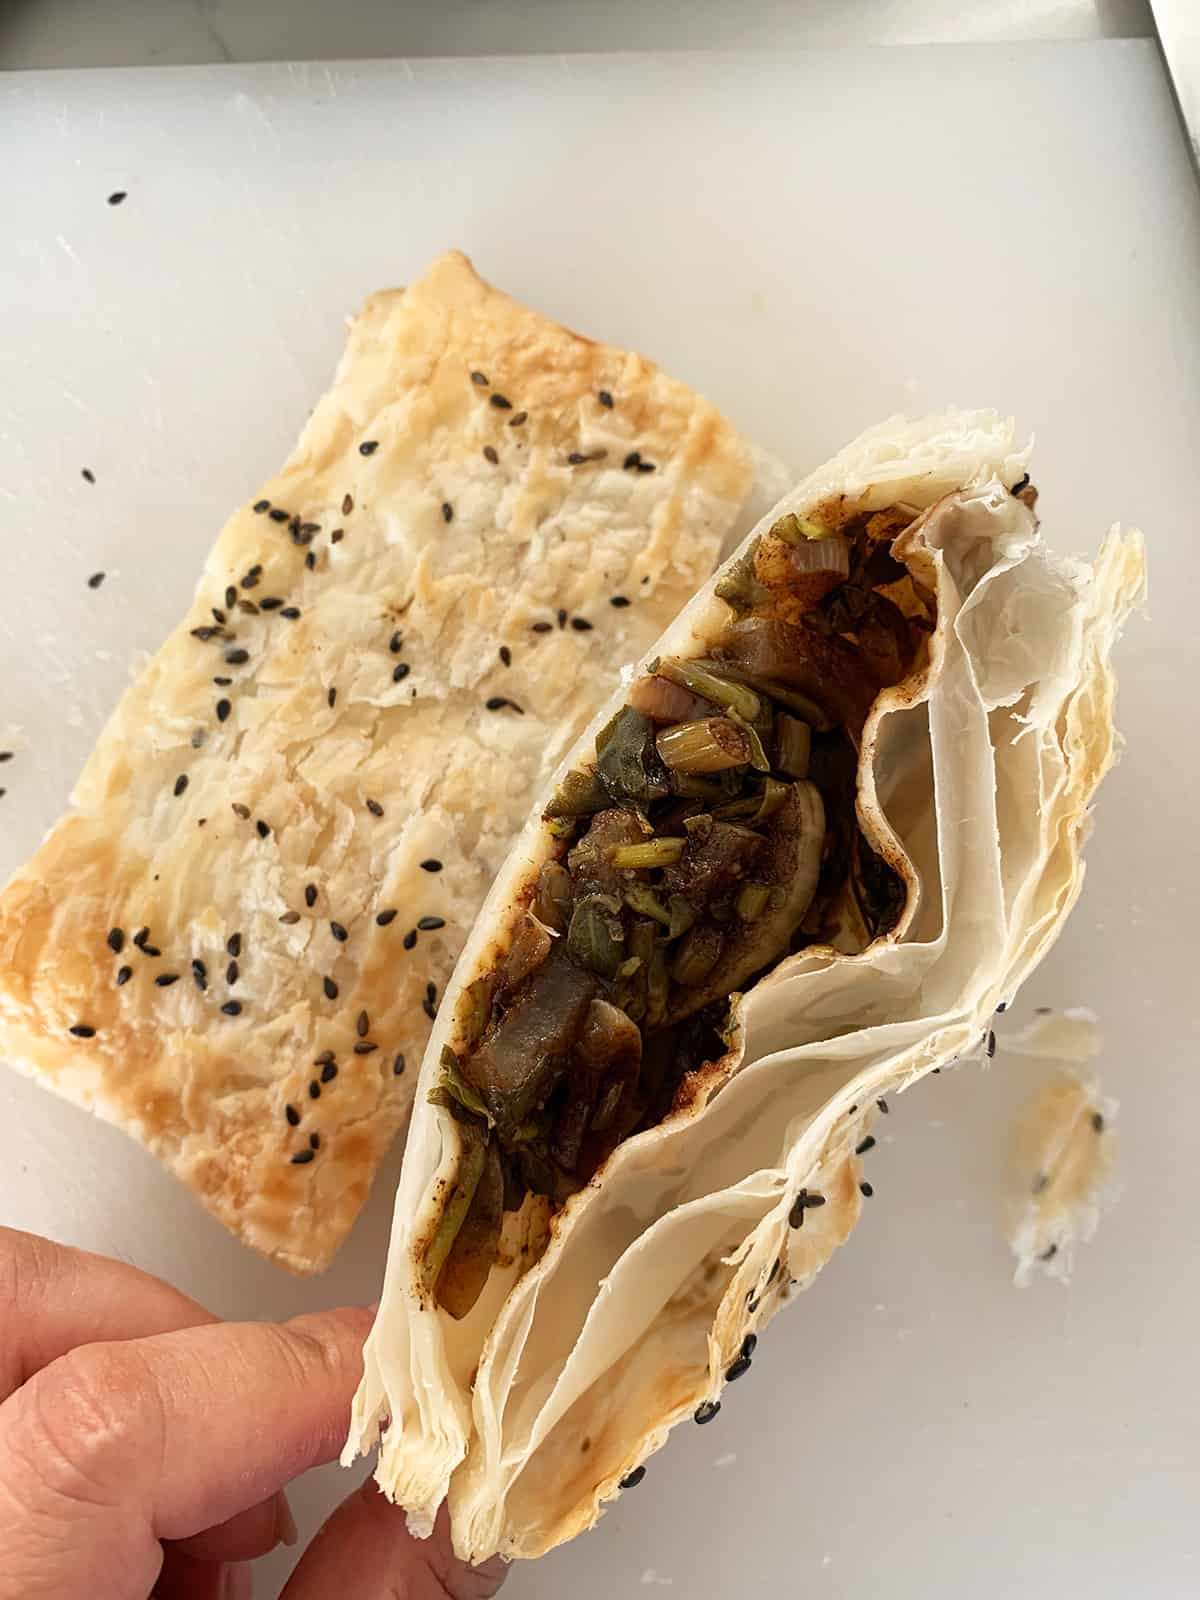 Inside of a cooked purslane/bakleh pocket